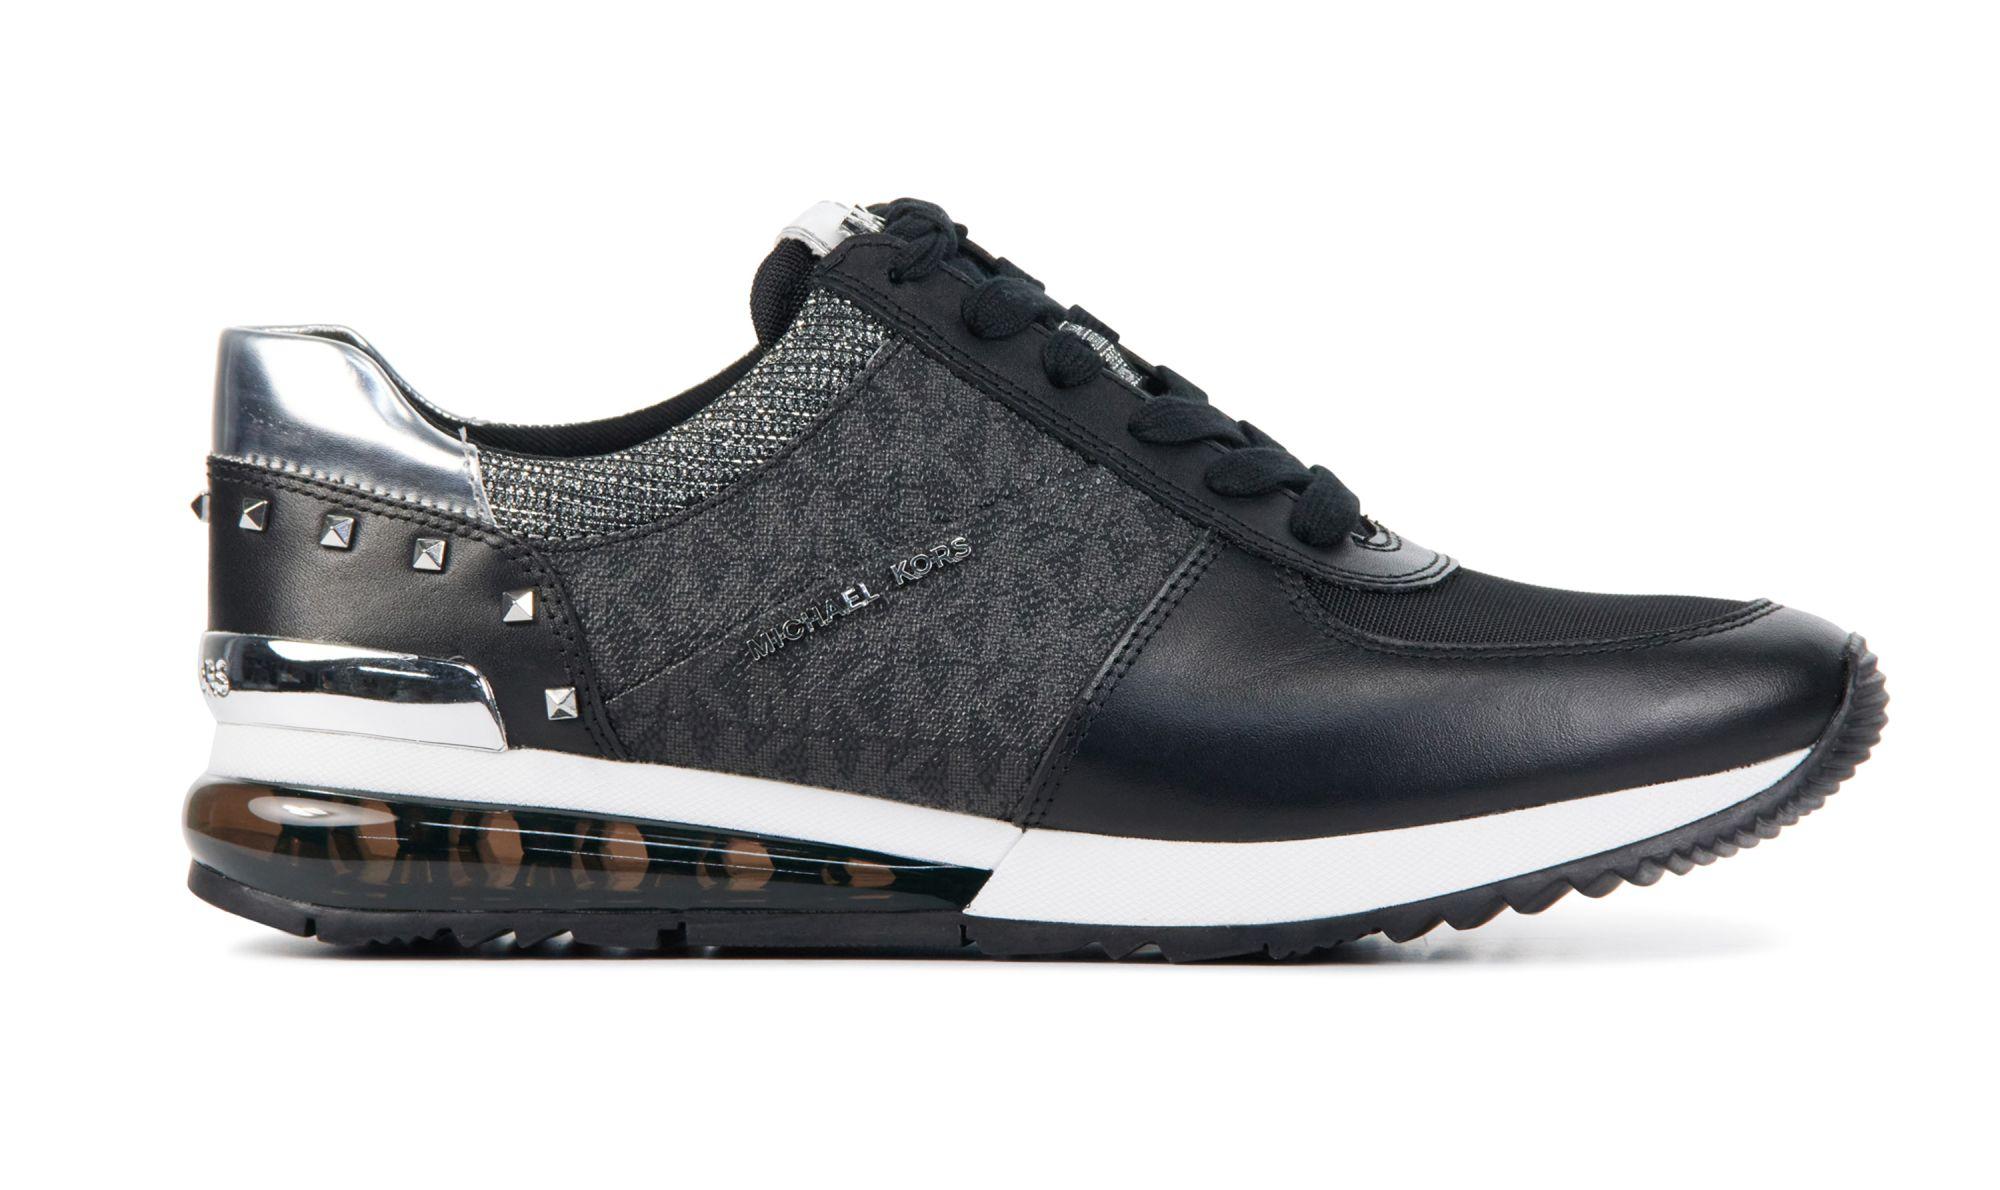 Michael Kors Dames Leren SneakersSneakers